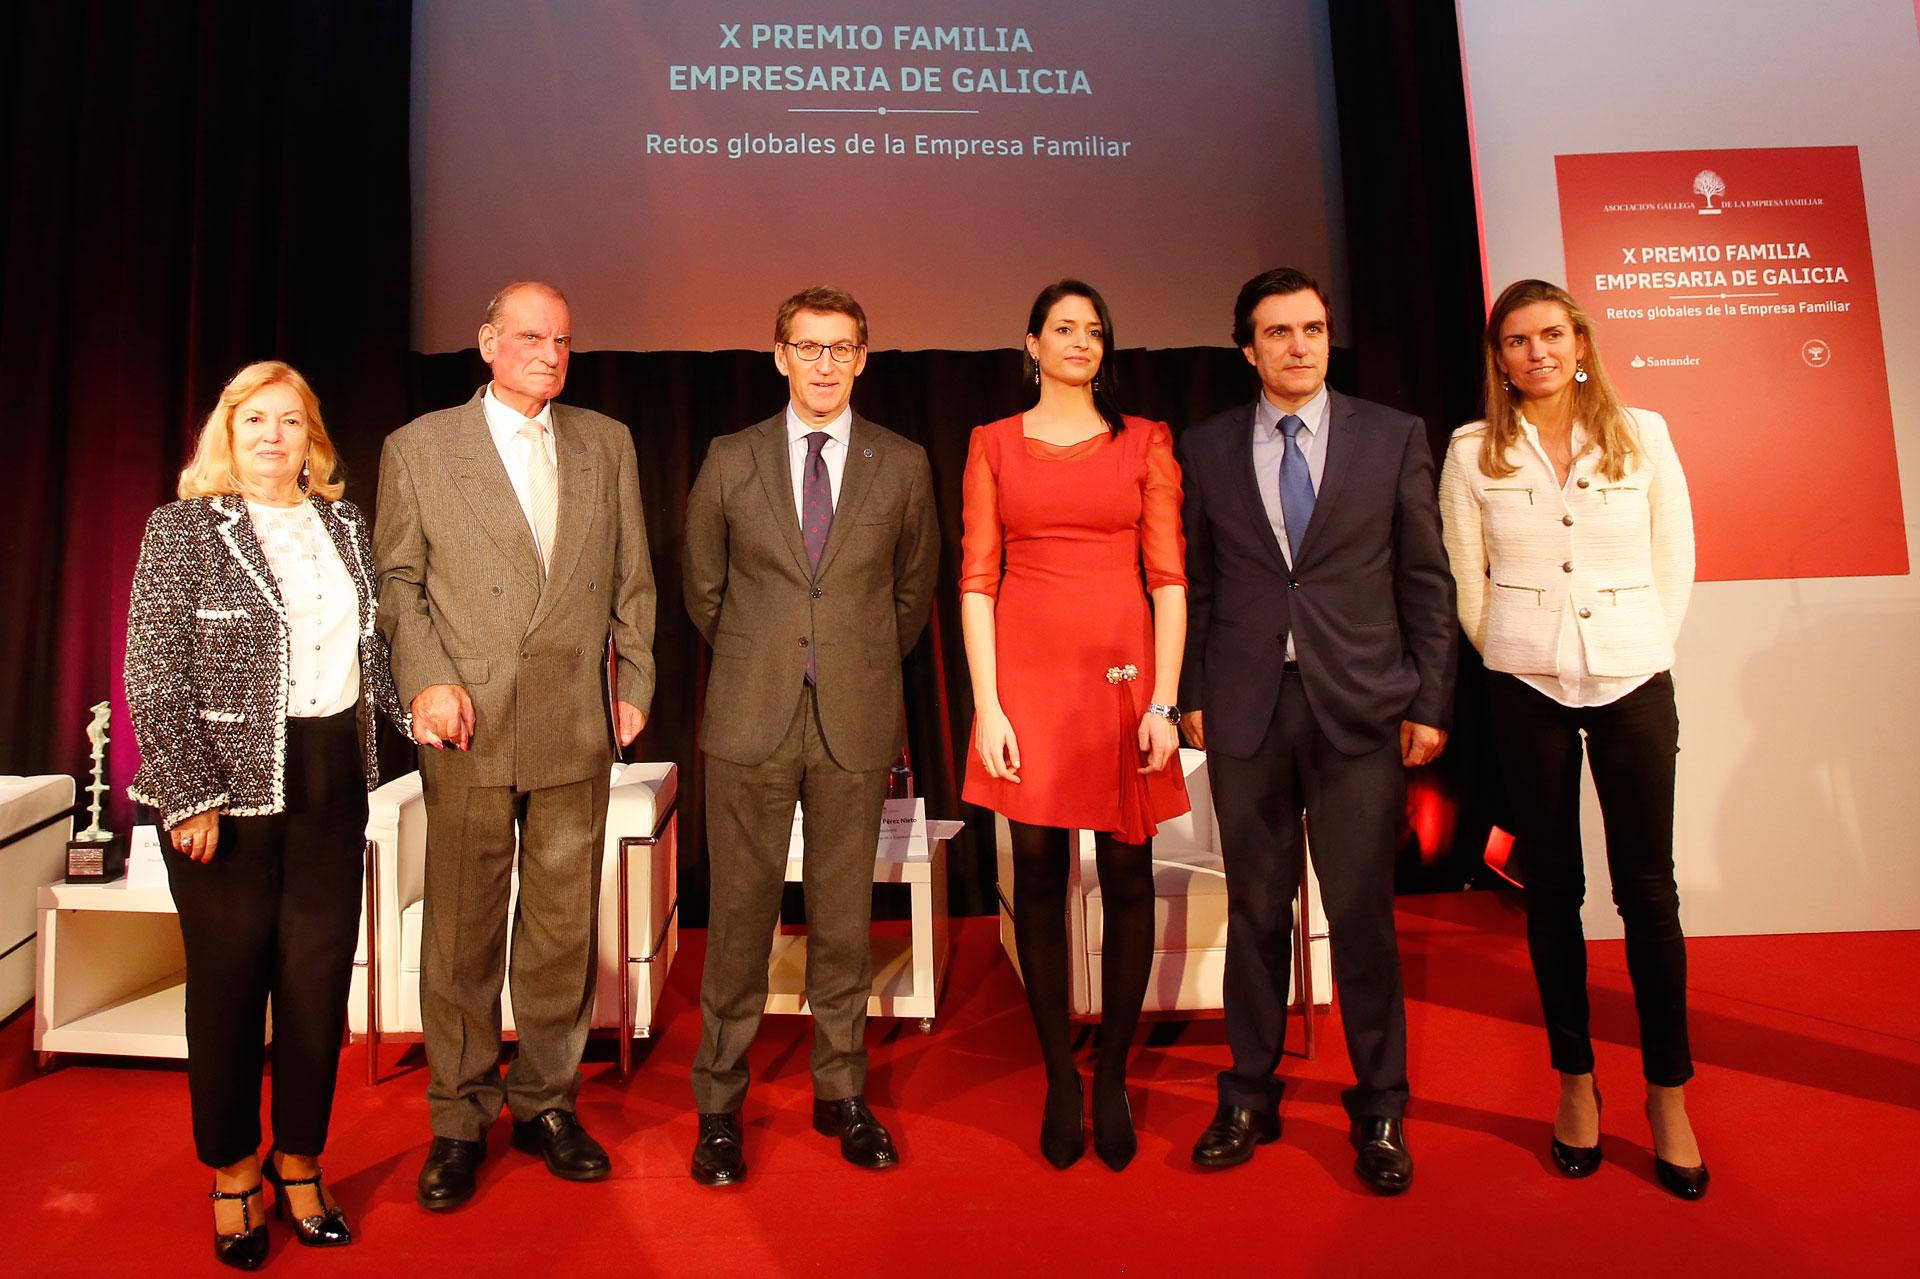 entrega-premio-familia-empresaria-galicia-froiz